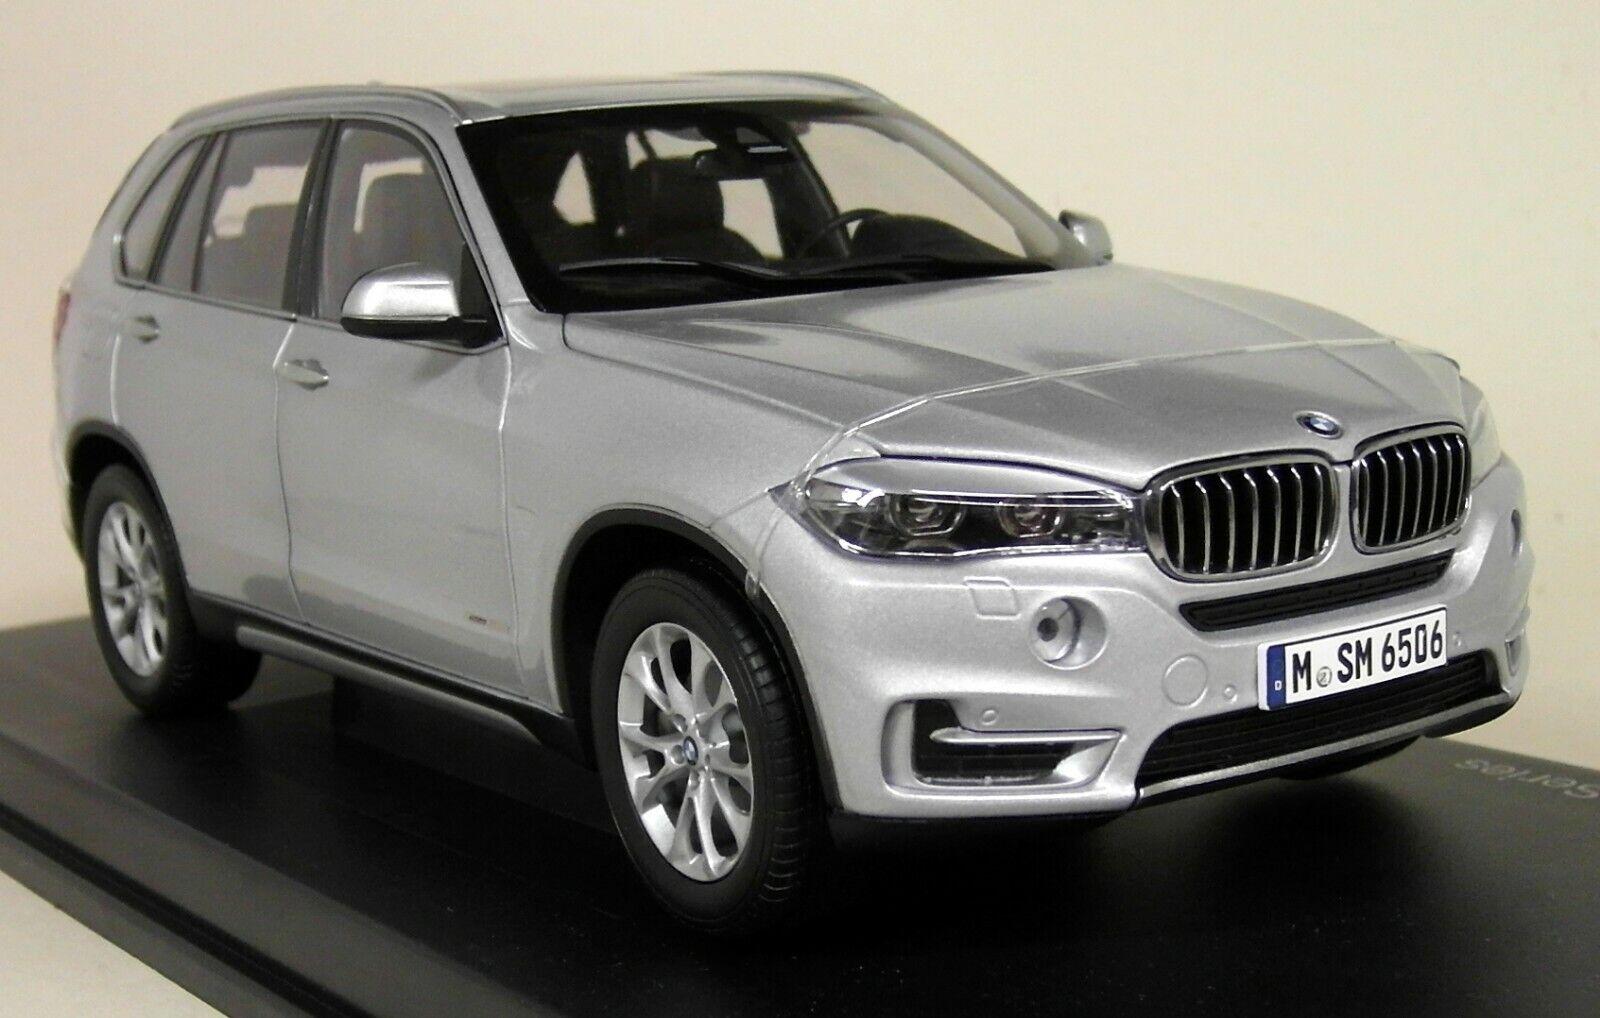 Paragon escala 1 18 - BMW X5 F15 LHD coche Modelo Diecast argento glaciar